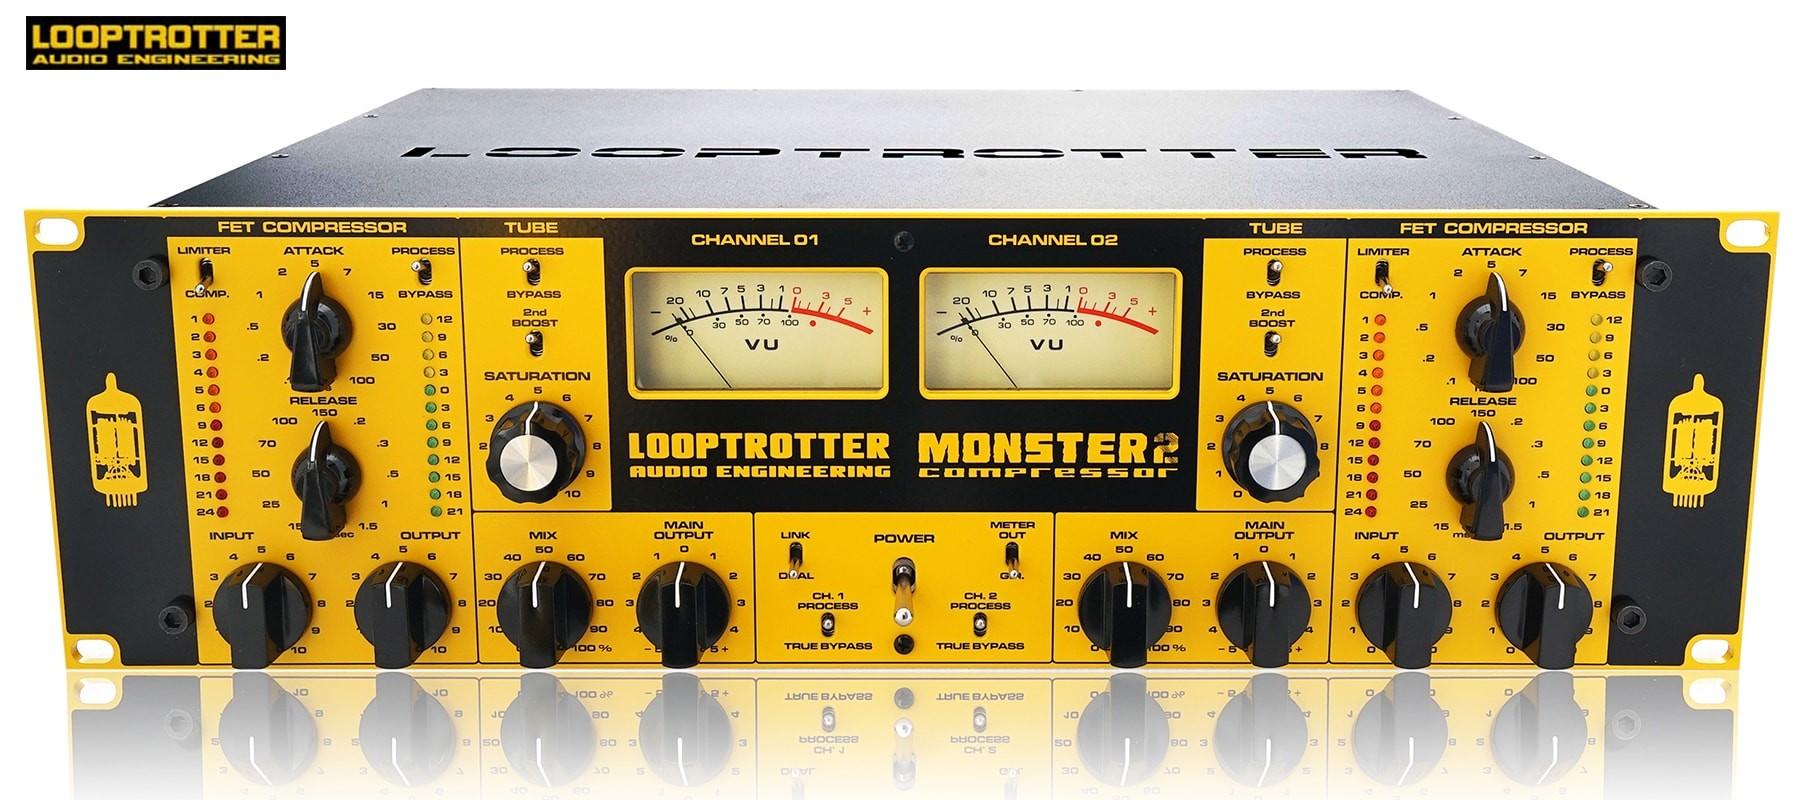 Looptrotter Monster 2